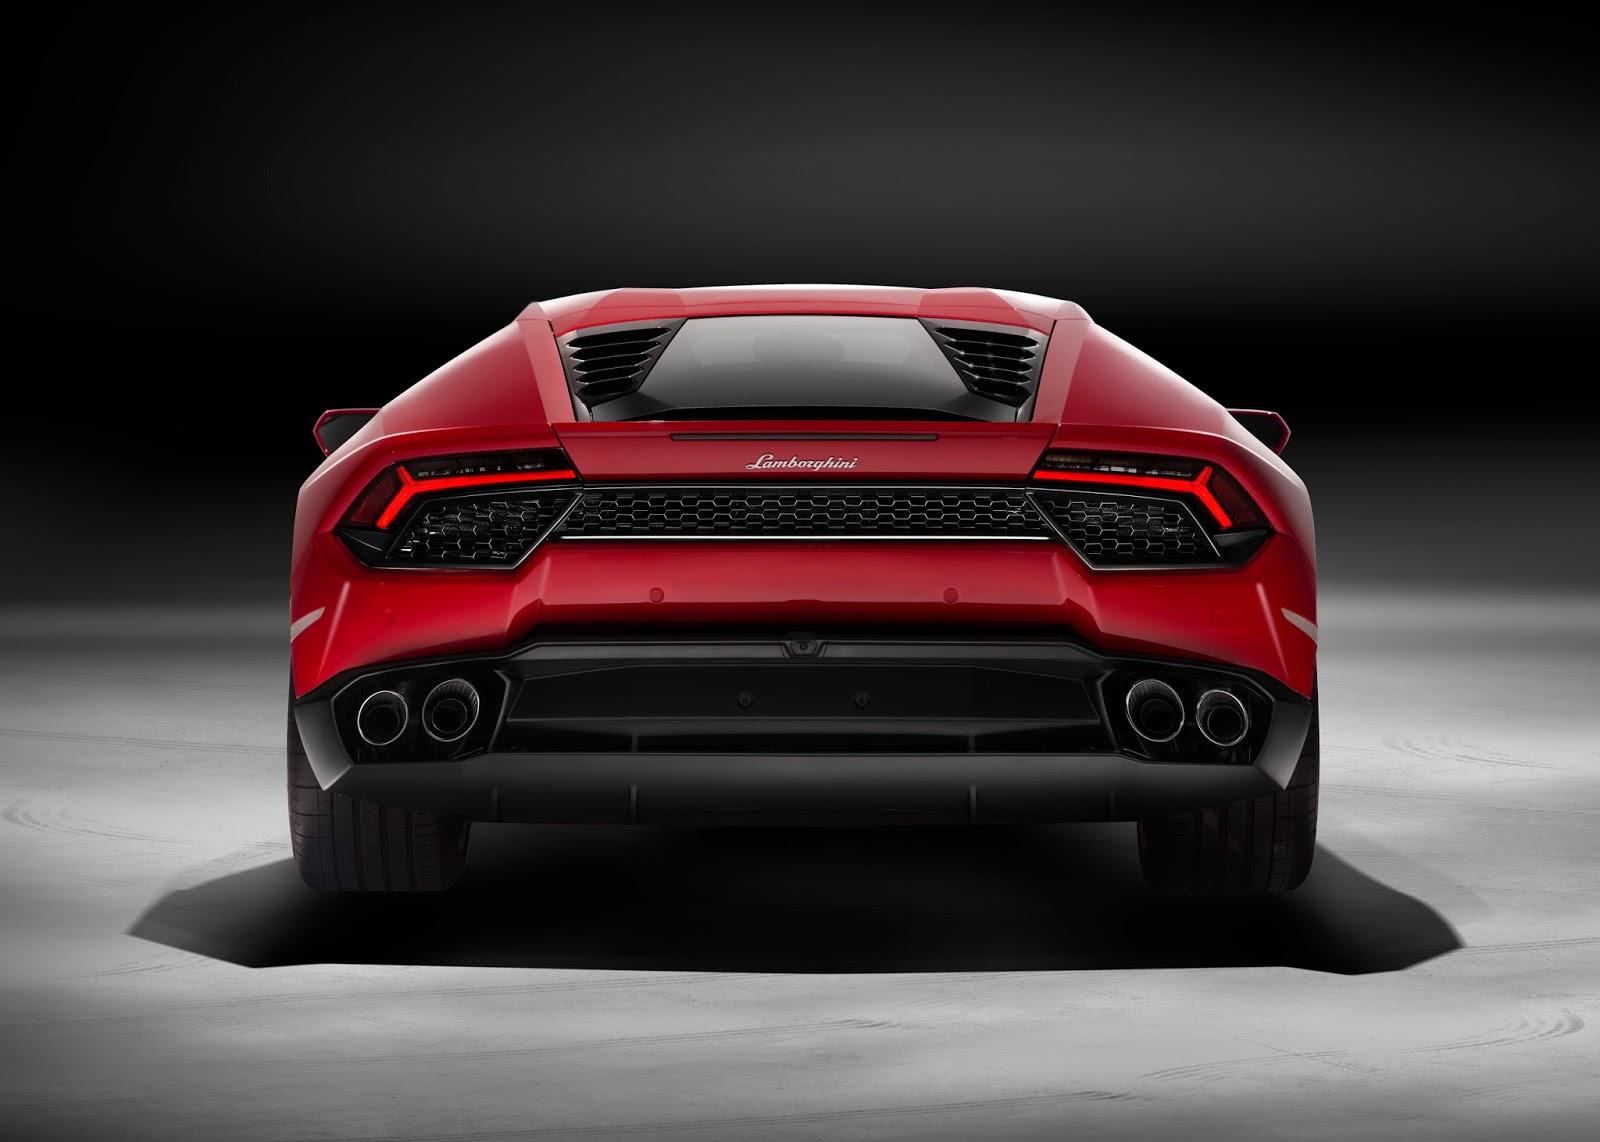 409497 Lamborghini Huracan LP580-2 : Η πιο fun to drive Lamborghini είναι πισωκίνητη και η φθηνότερη Lamborghini, Lamborghini Huracan, Lamborghini Huracan LP580-2, supercars, videos